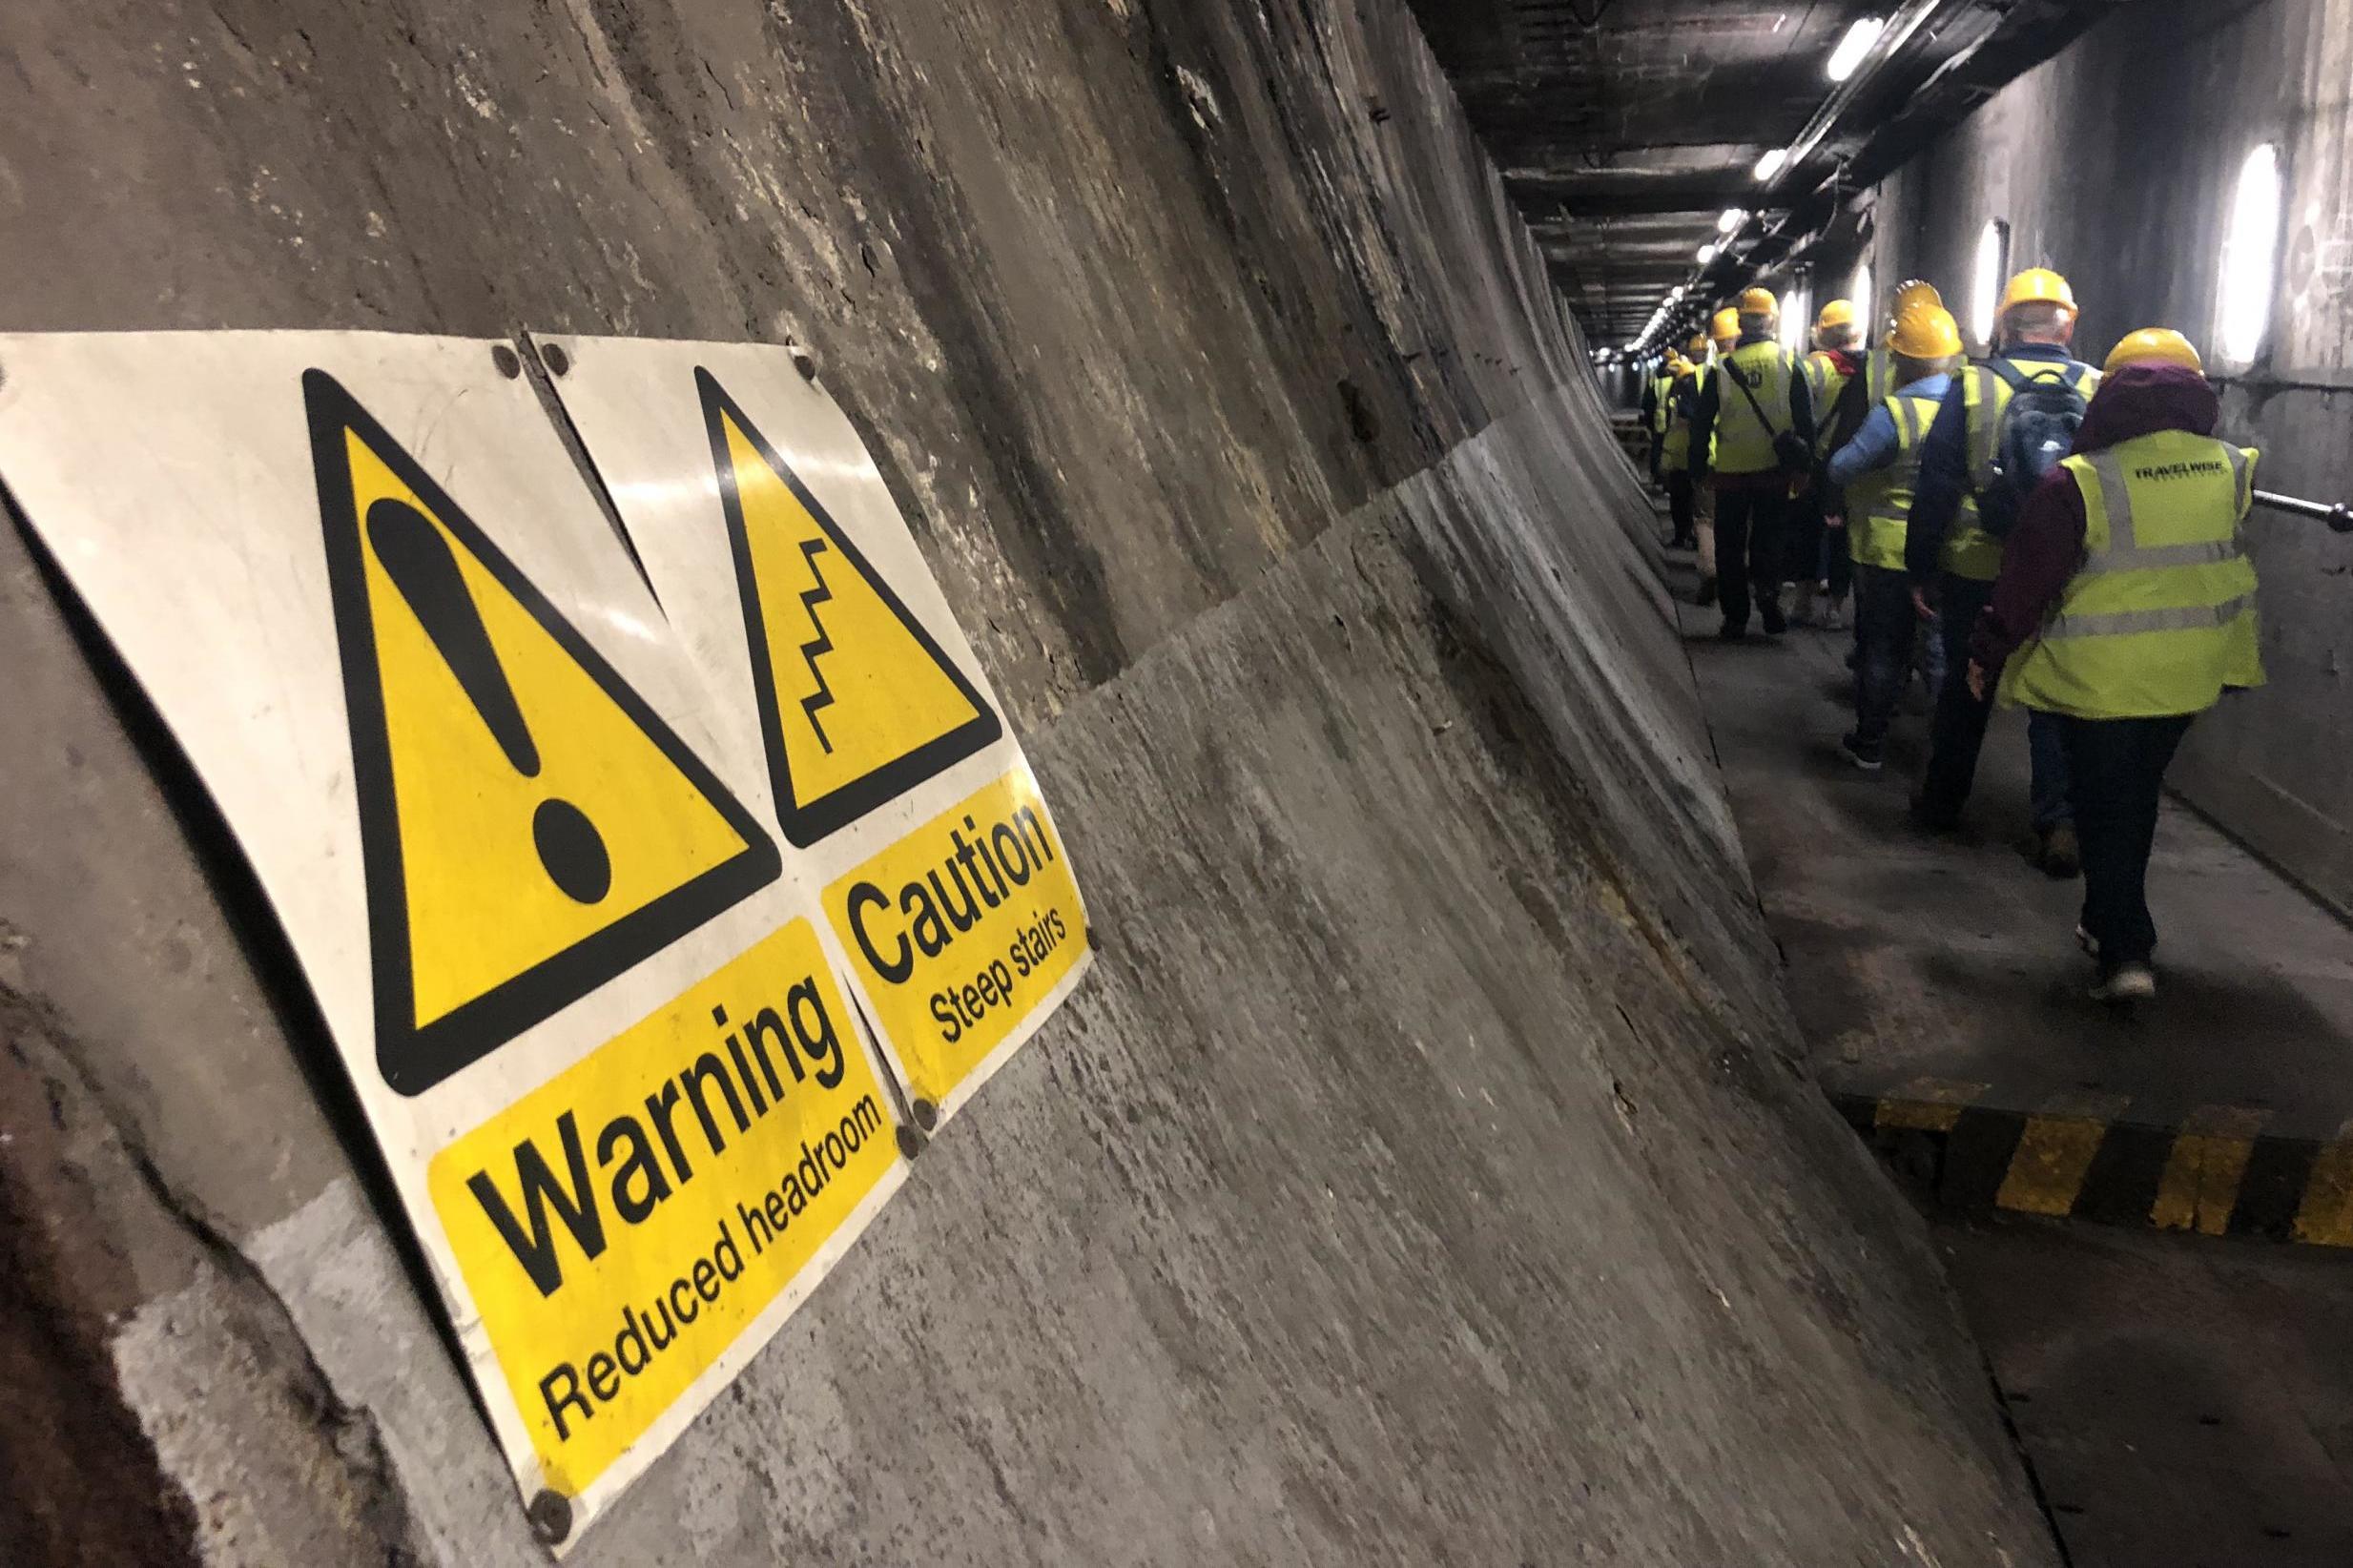 Going underground: A subterranean exploration of Liverpool